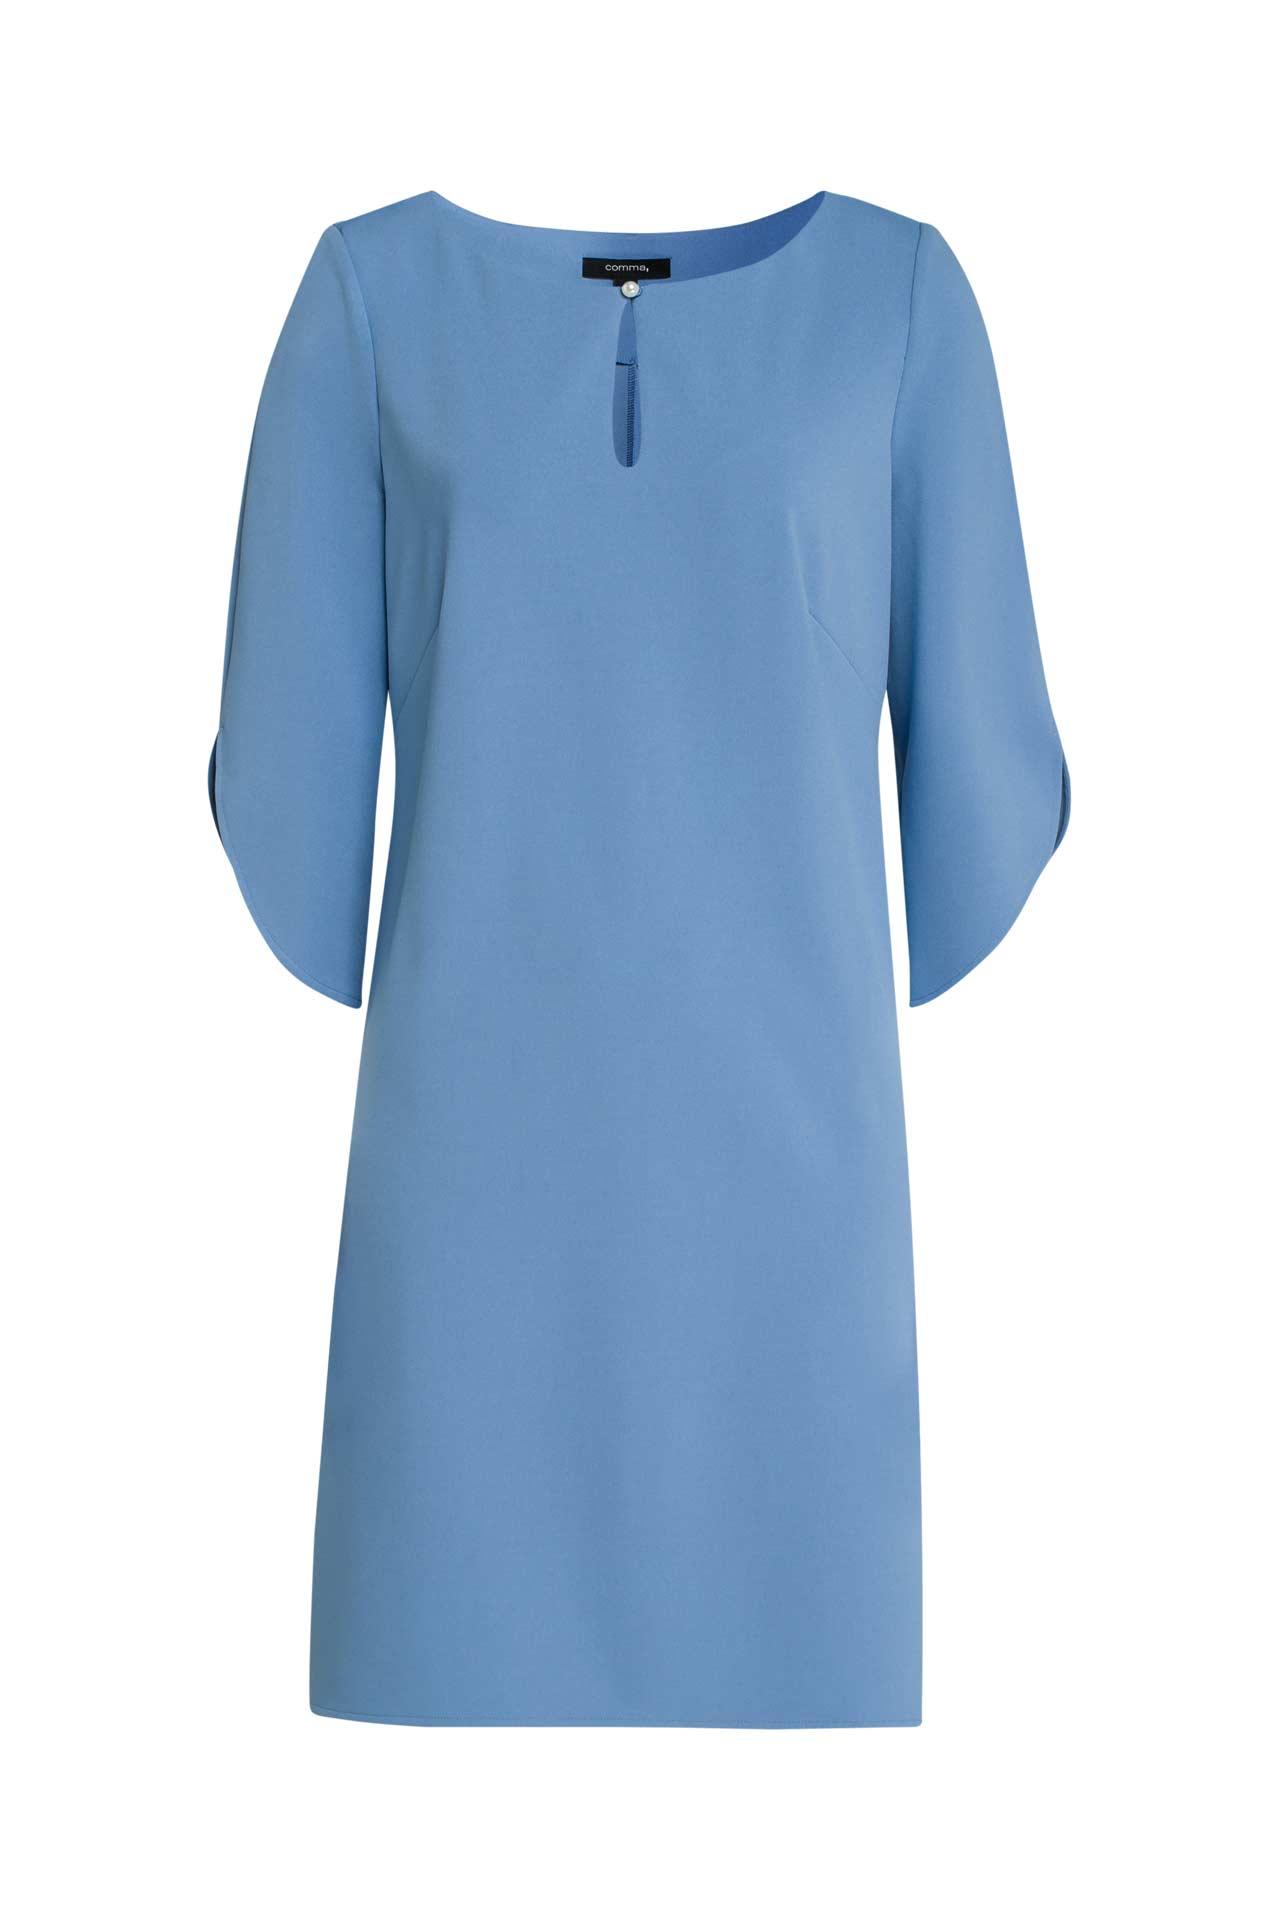 Kleid hellblau - COMMA » günstig online kaufen ...